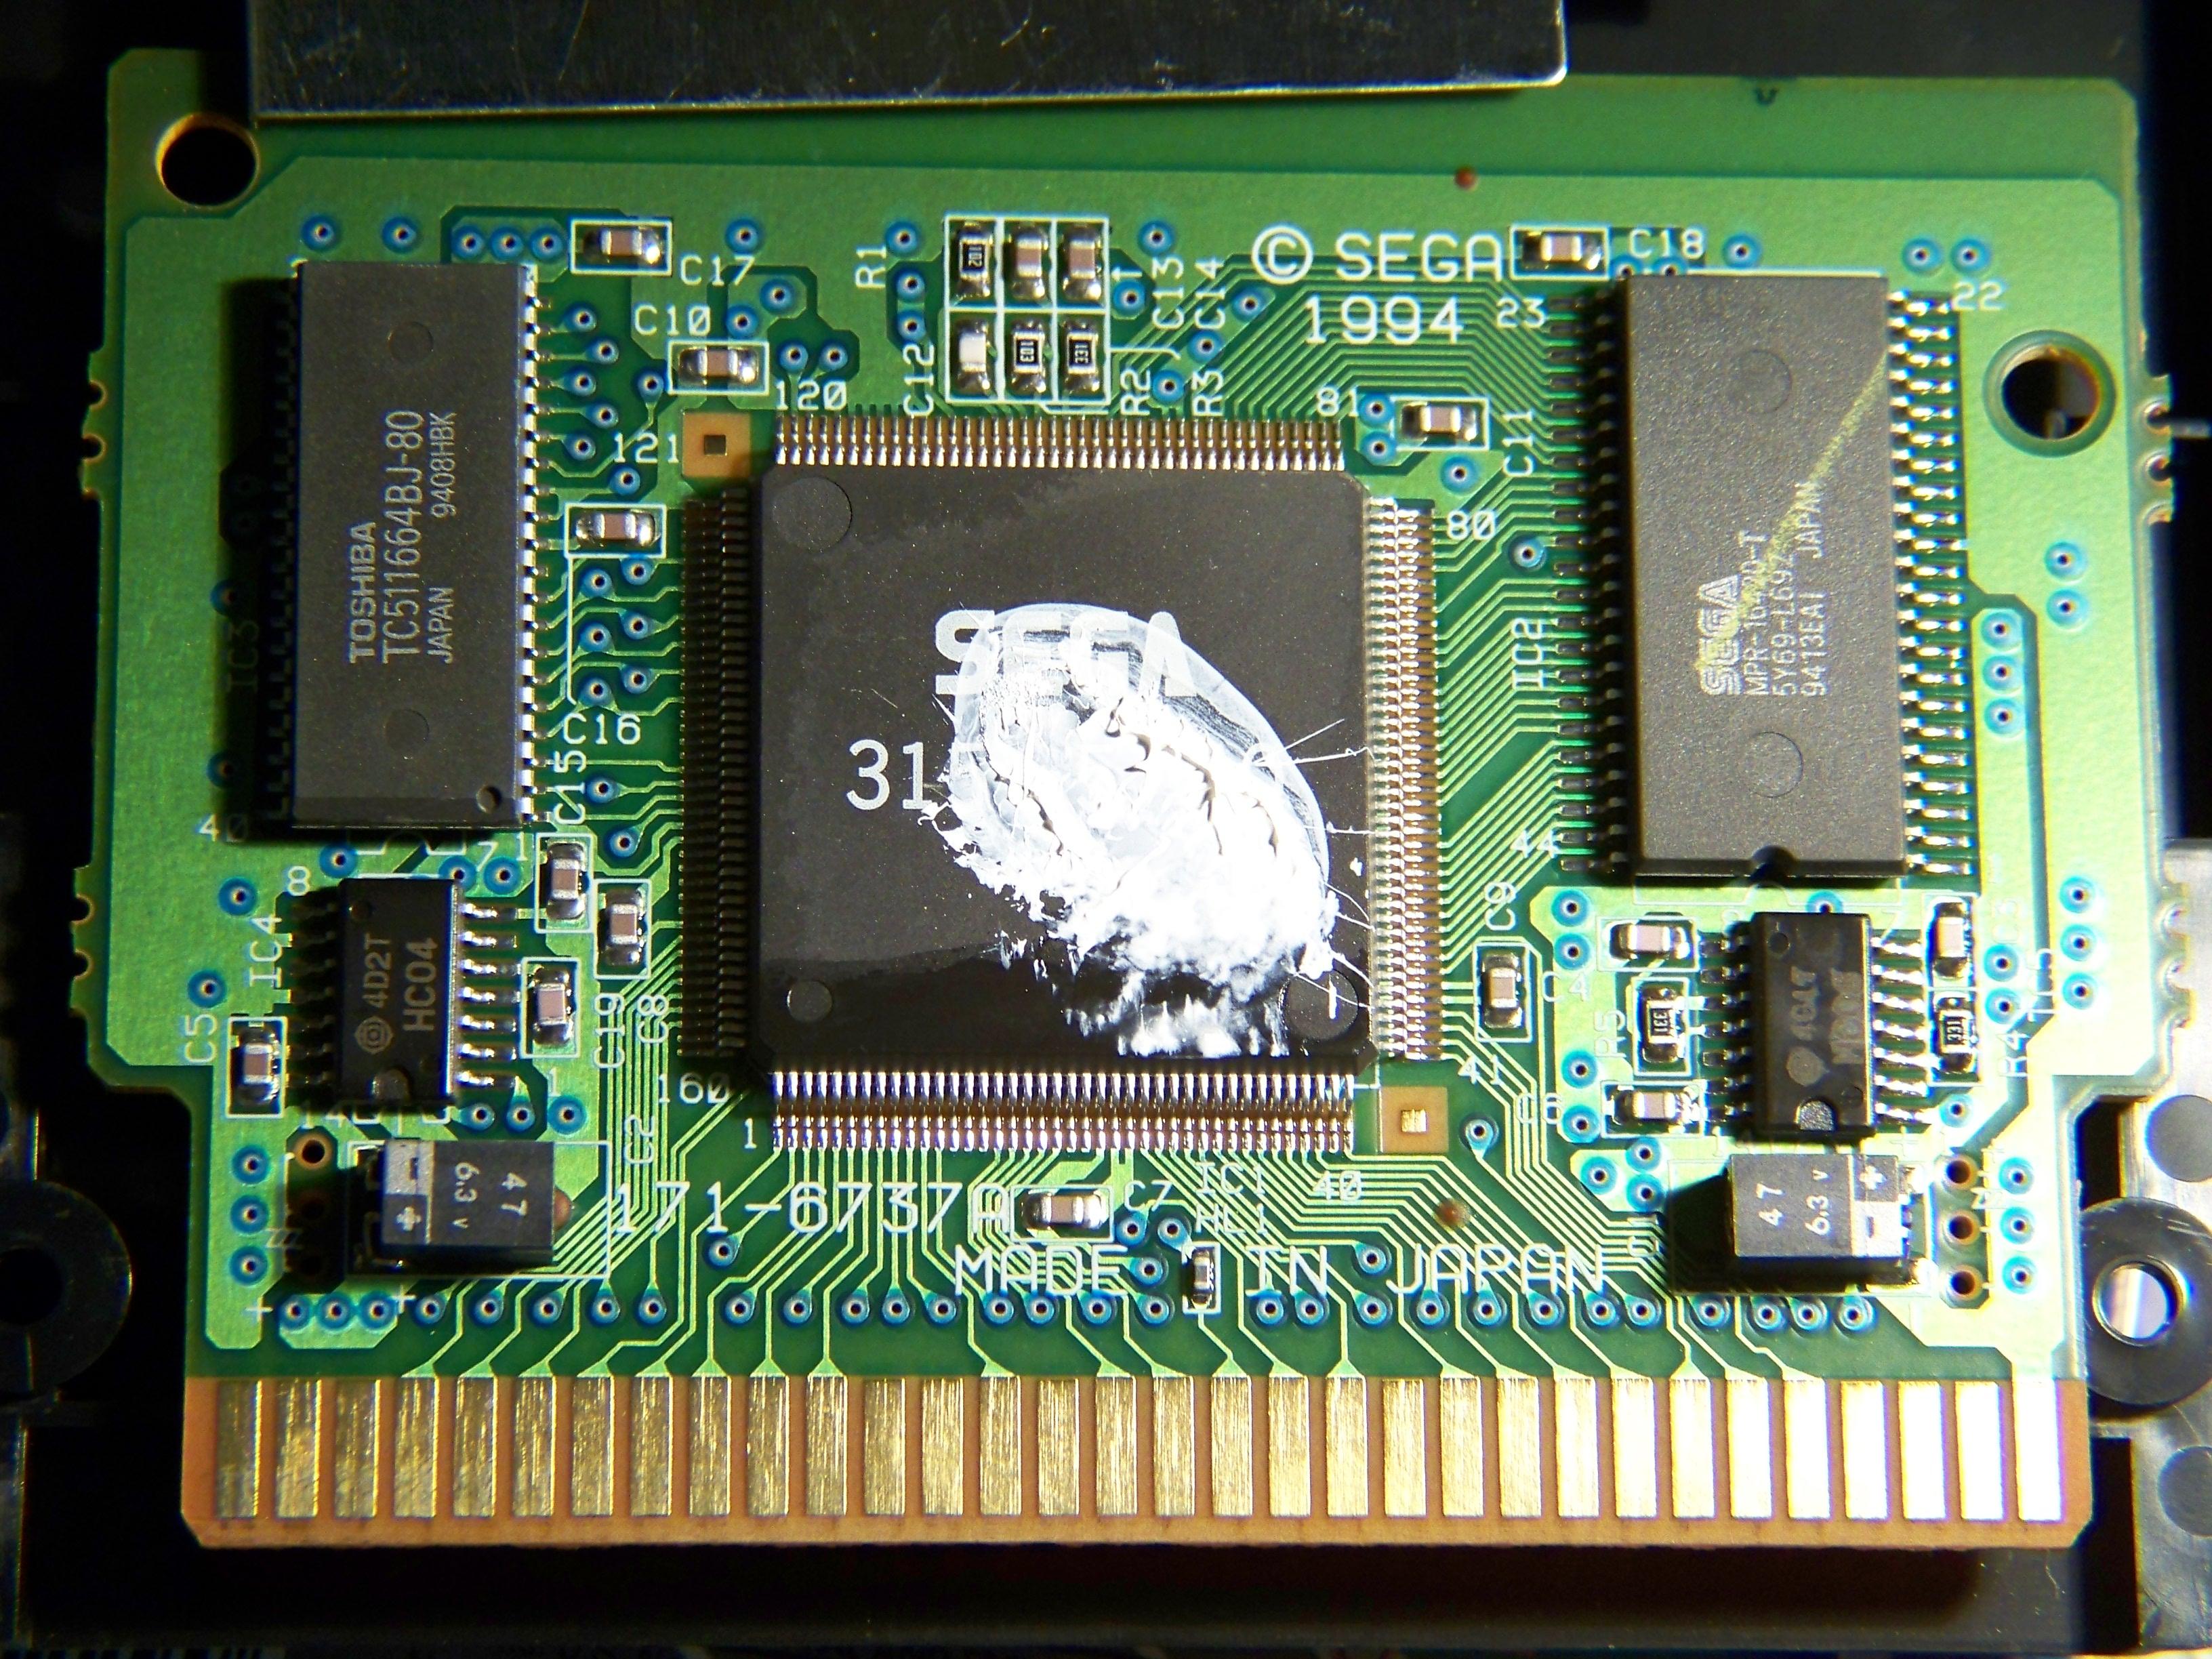 virtua racing megadrive - Page 2 Photo_inside_the_Sega_MegaDrive_Virtua_Racing%2C_showing_the_SVP_%28Sega_Virtua_Processor%29_chip